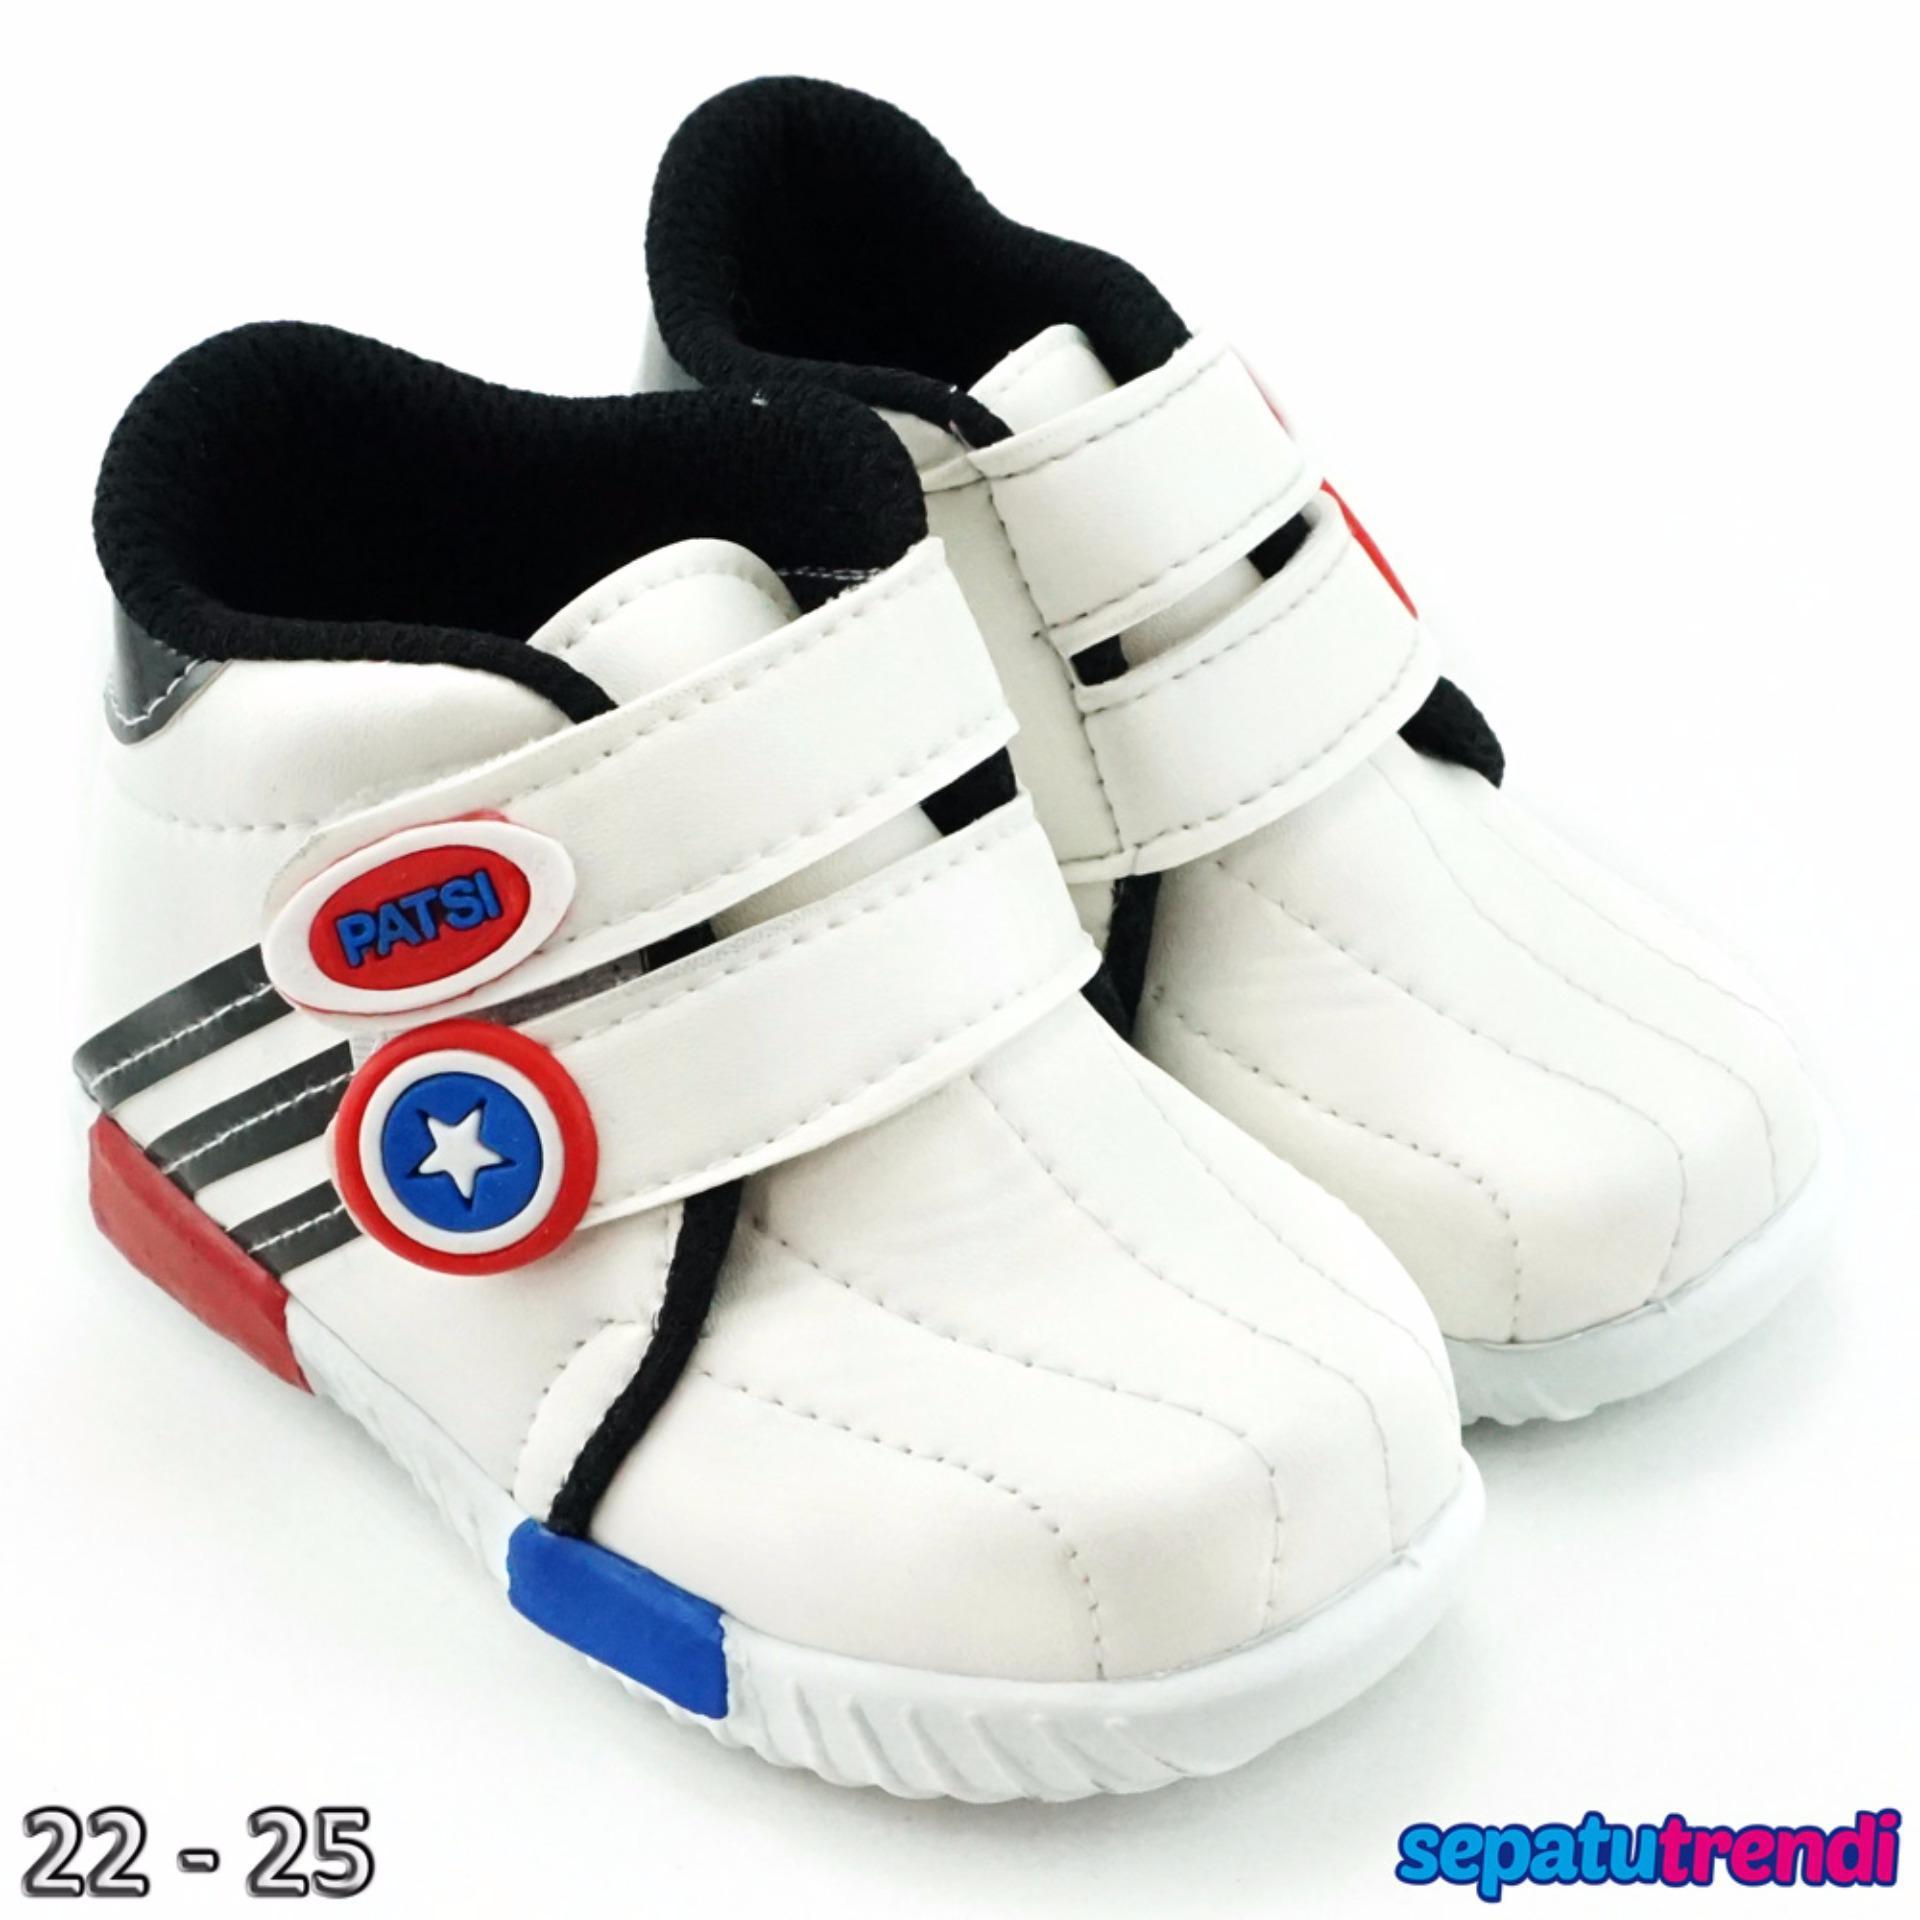 Harga Trendishoes Sepatu Anak Laki Laki Sport High Cut Semi Boot Jbk Hitam Trendishoes Indonesia